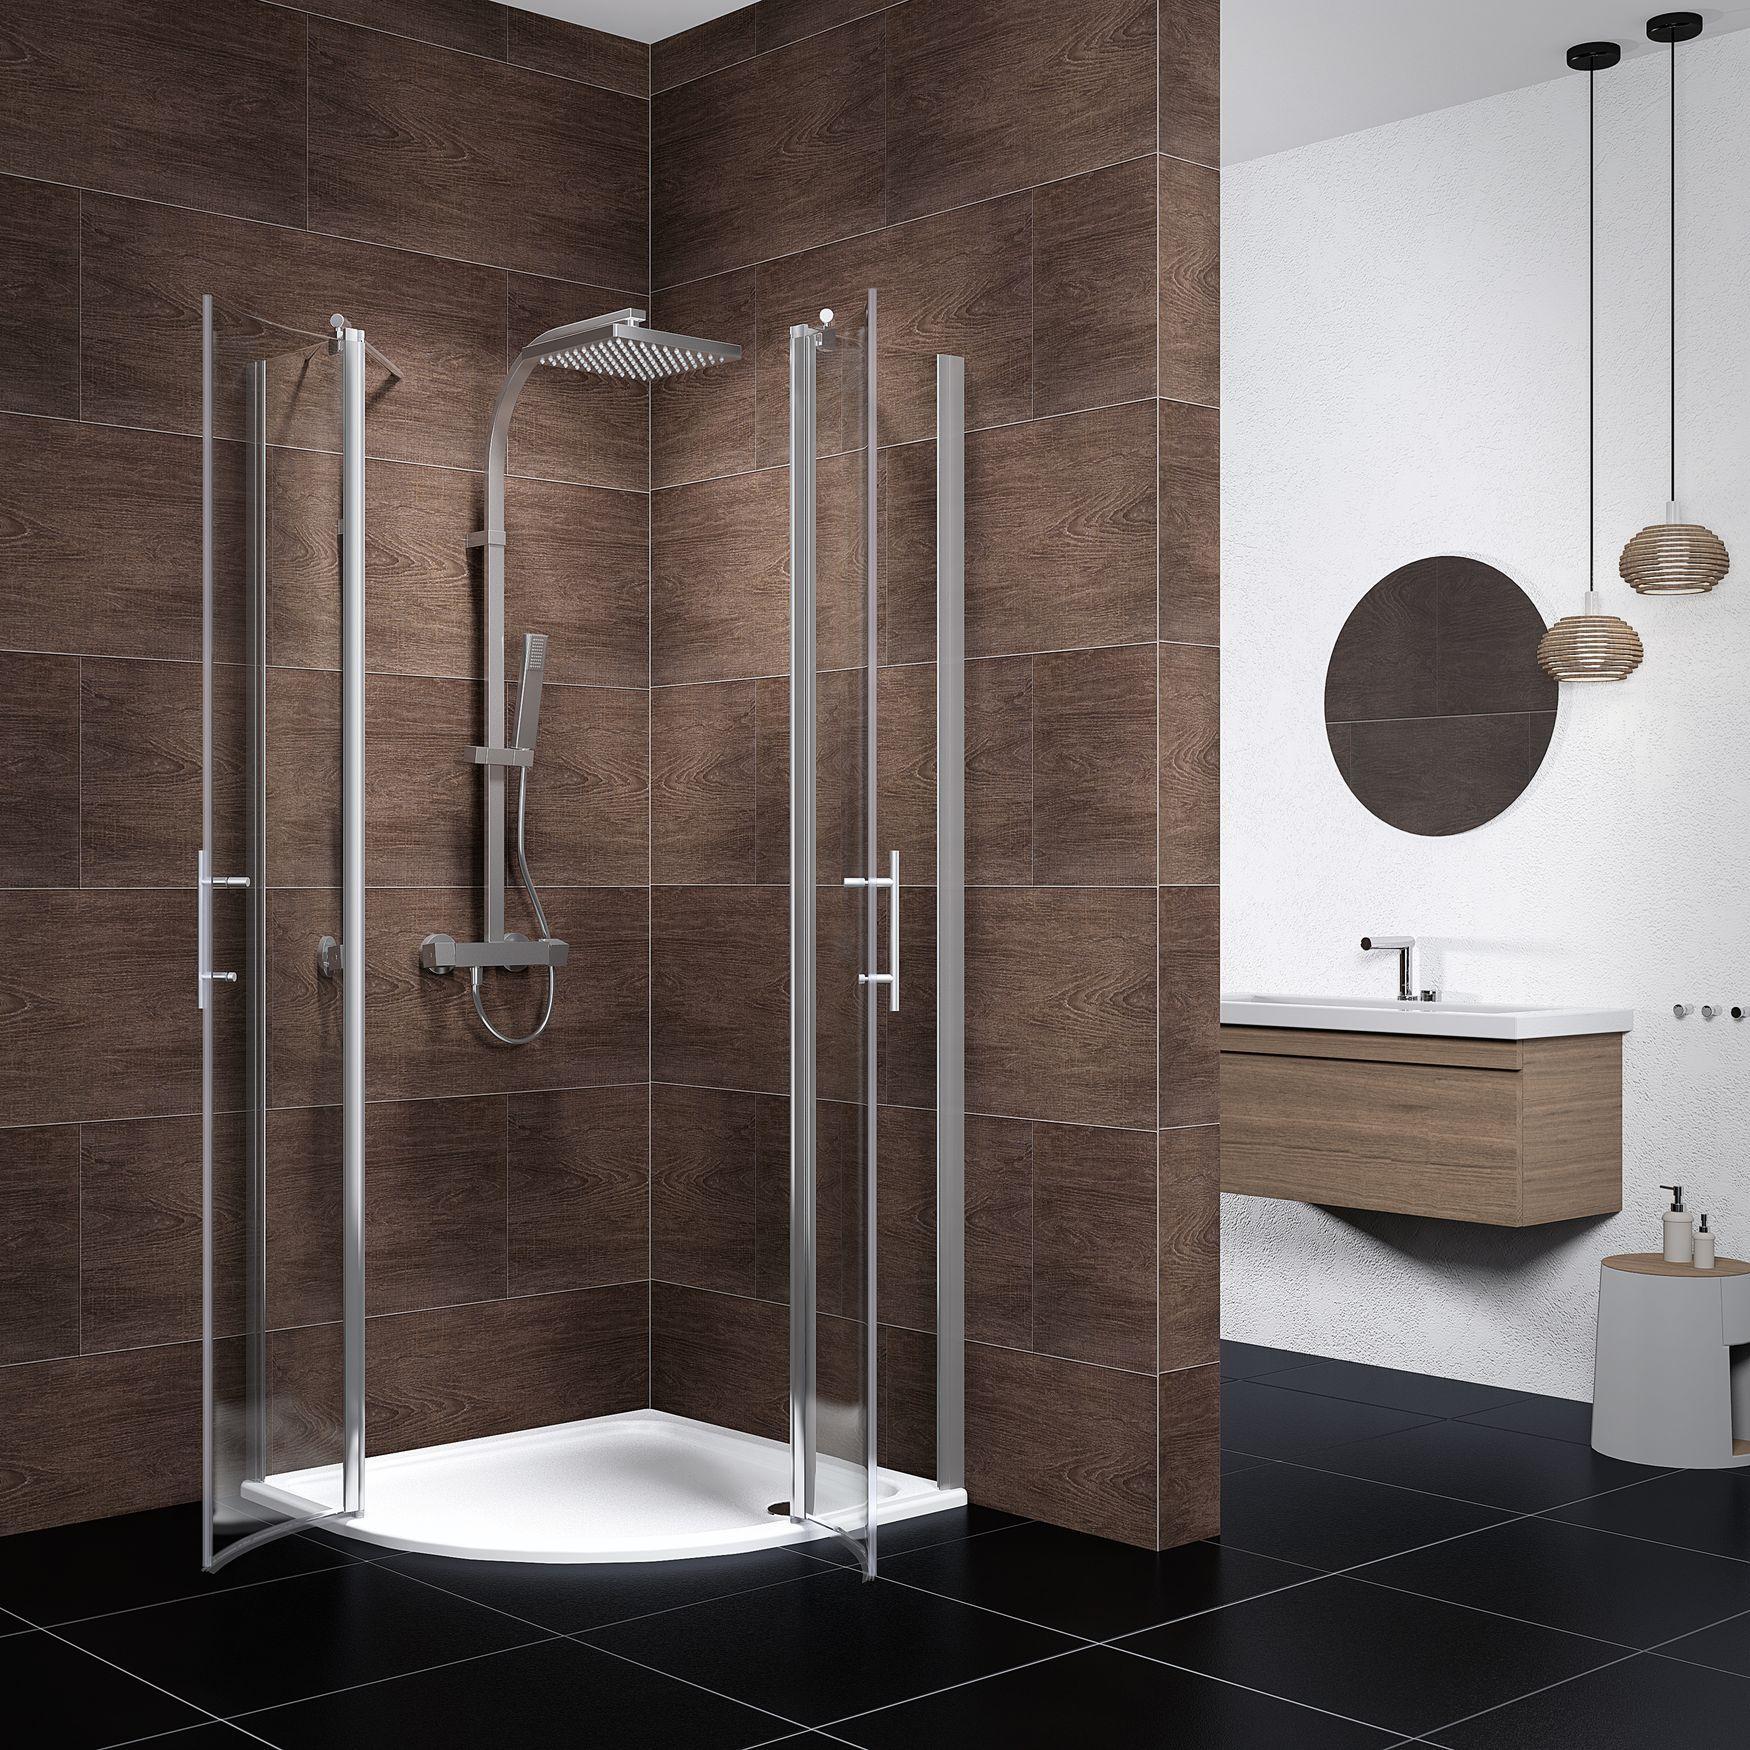 schulte duschkabine lazio 90x90 cm 192 cm radius 500 mm 5 mm sicherheitsglas klar. Black Bedroom Furniture Sets. Home Design Ideas